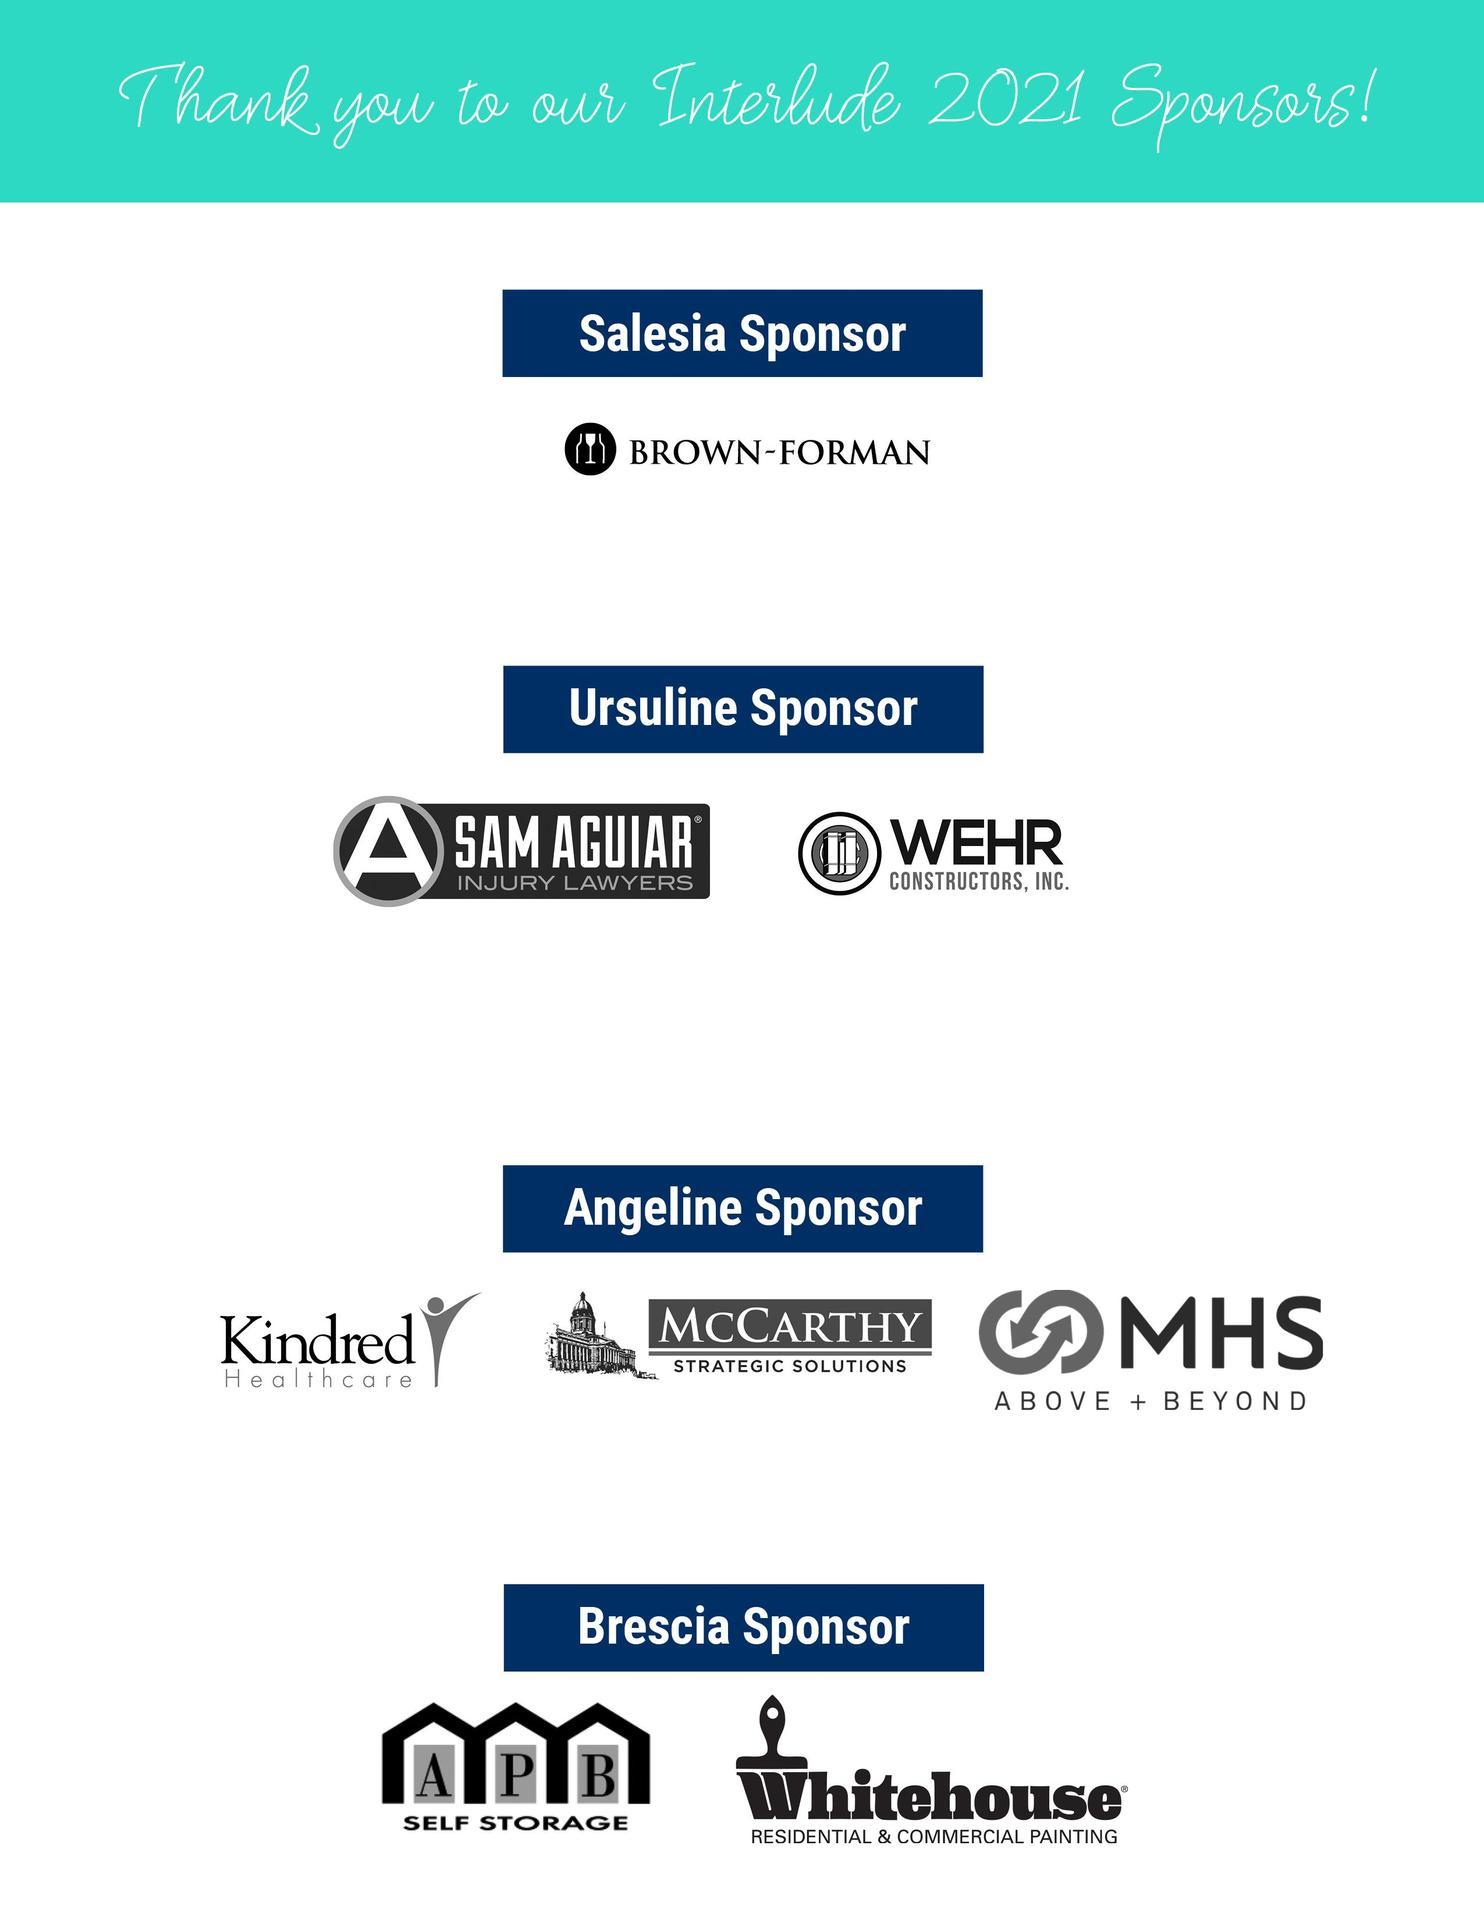 Interlude-Sponsors-2021